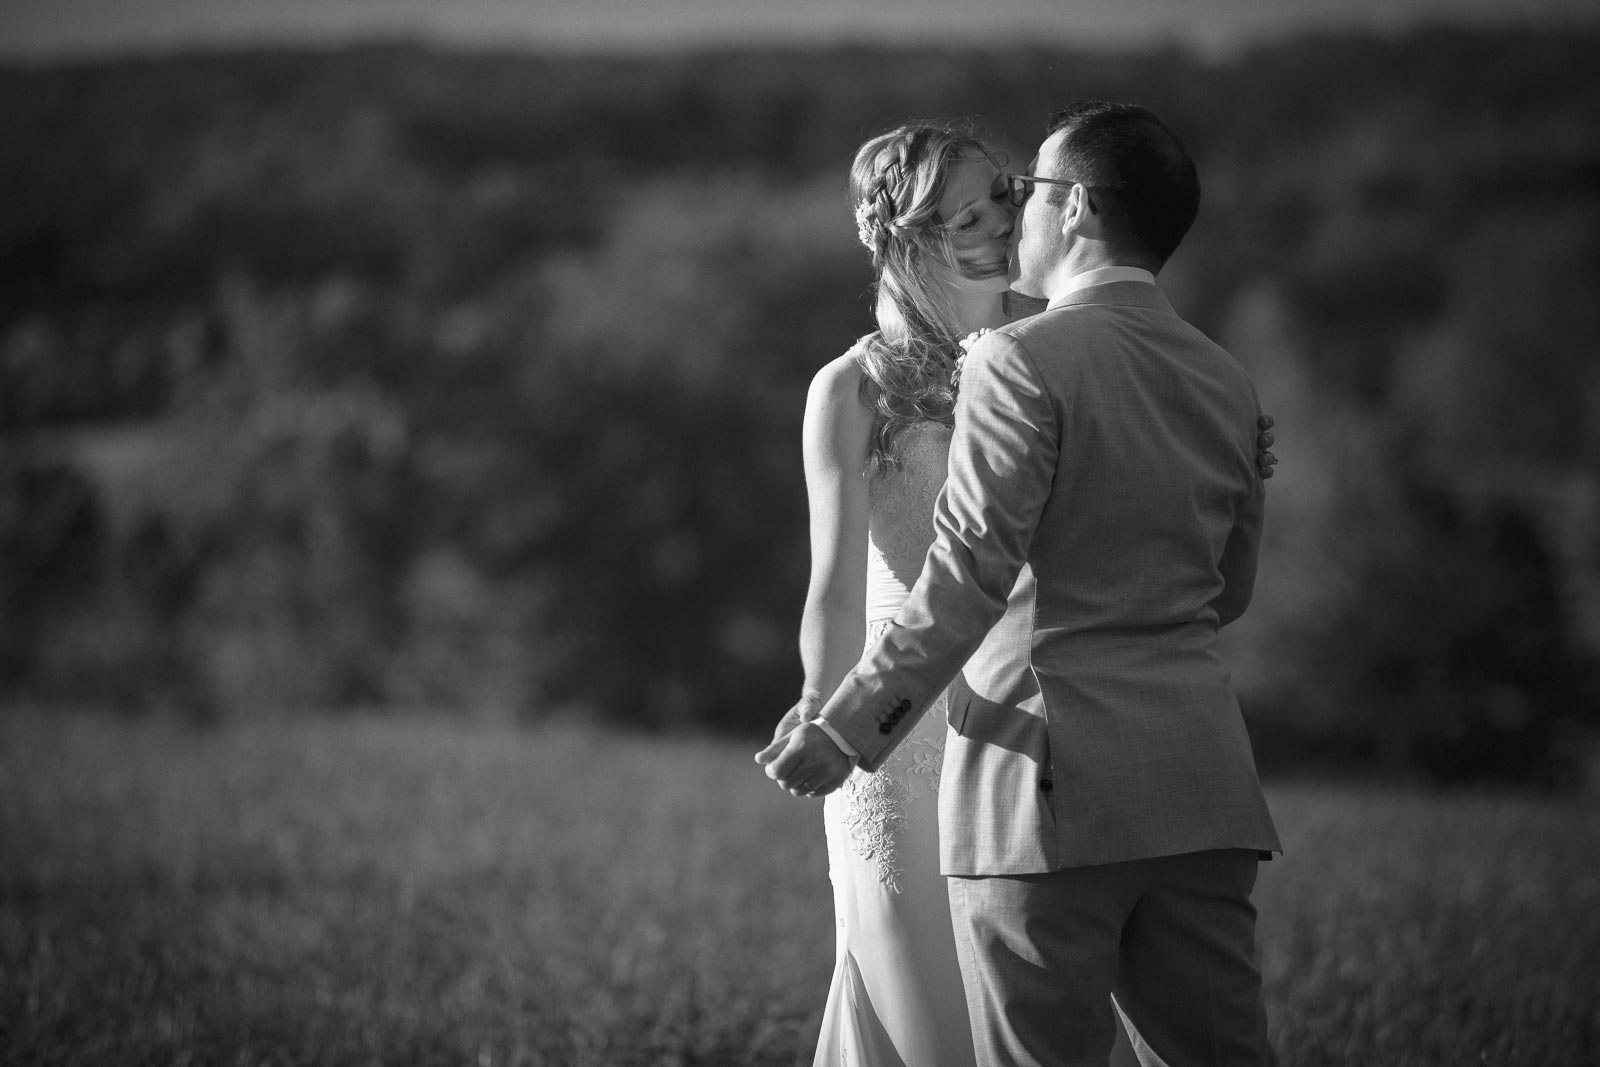 barn-at-liberty-farms-wedding-hudson-valley-alekseyk-photography-52.jpg